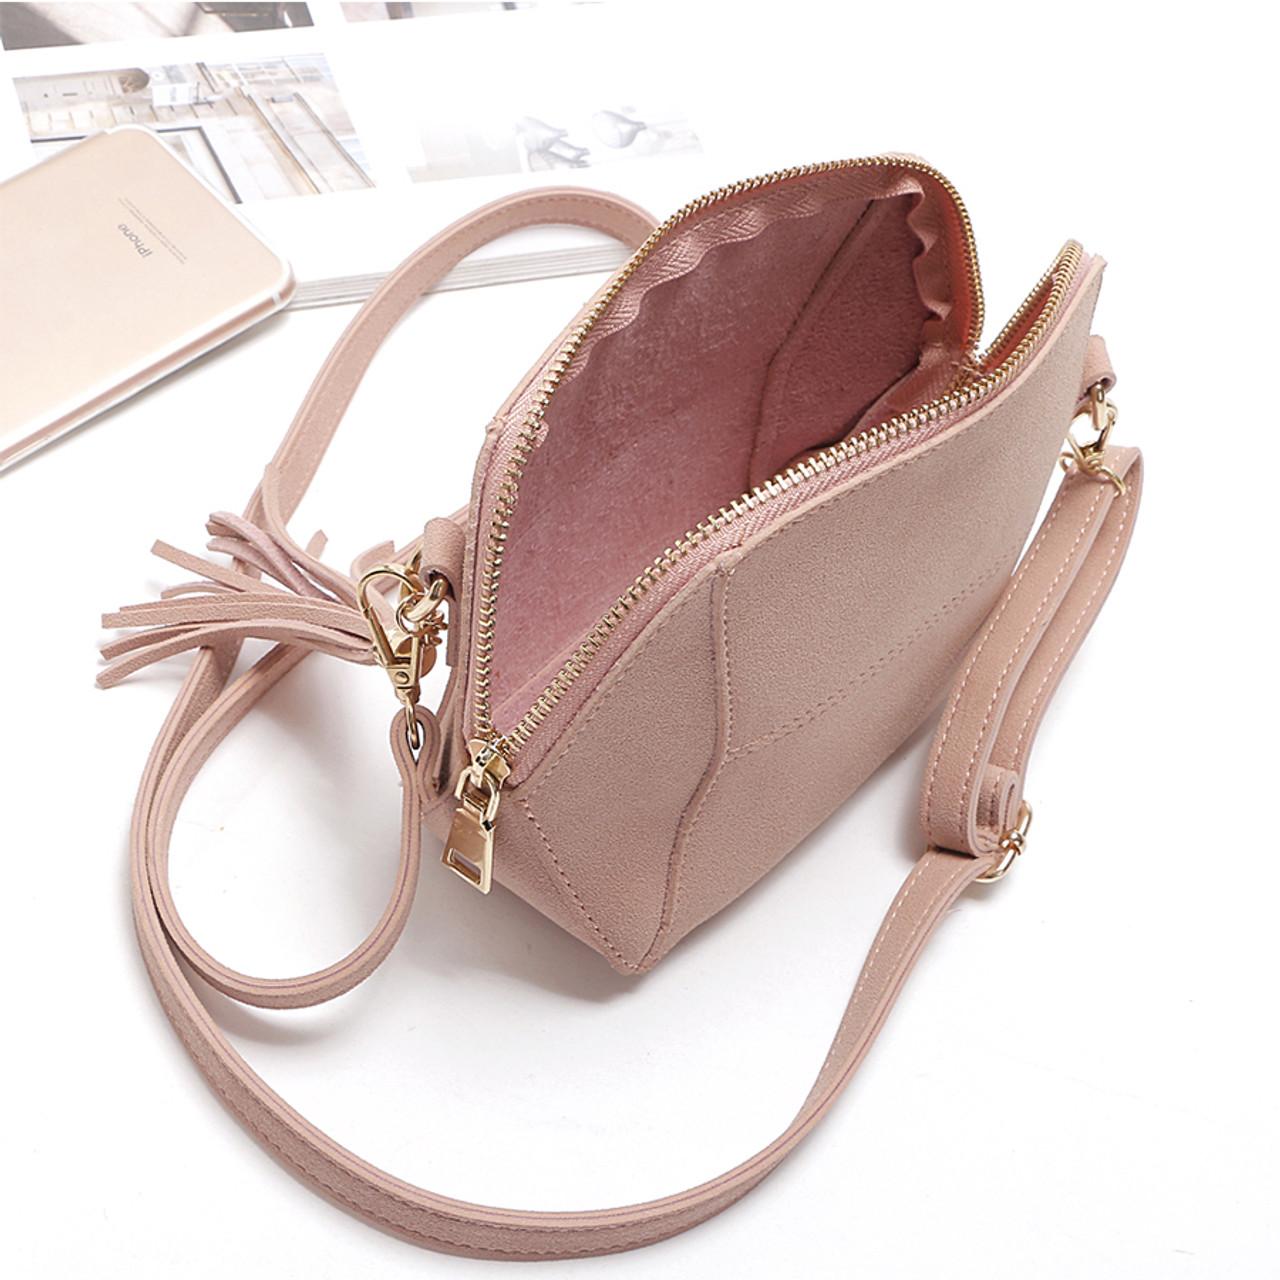 32dcf2ebc ... Fringe Crossbody Bag Women Suede Clutch Bag Girl Fashion Messenger  Shoulder Handbags Ladies Beach Holiday Tassel ...